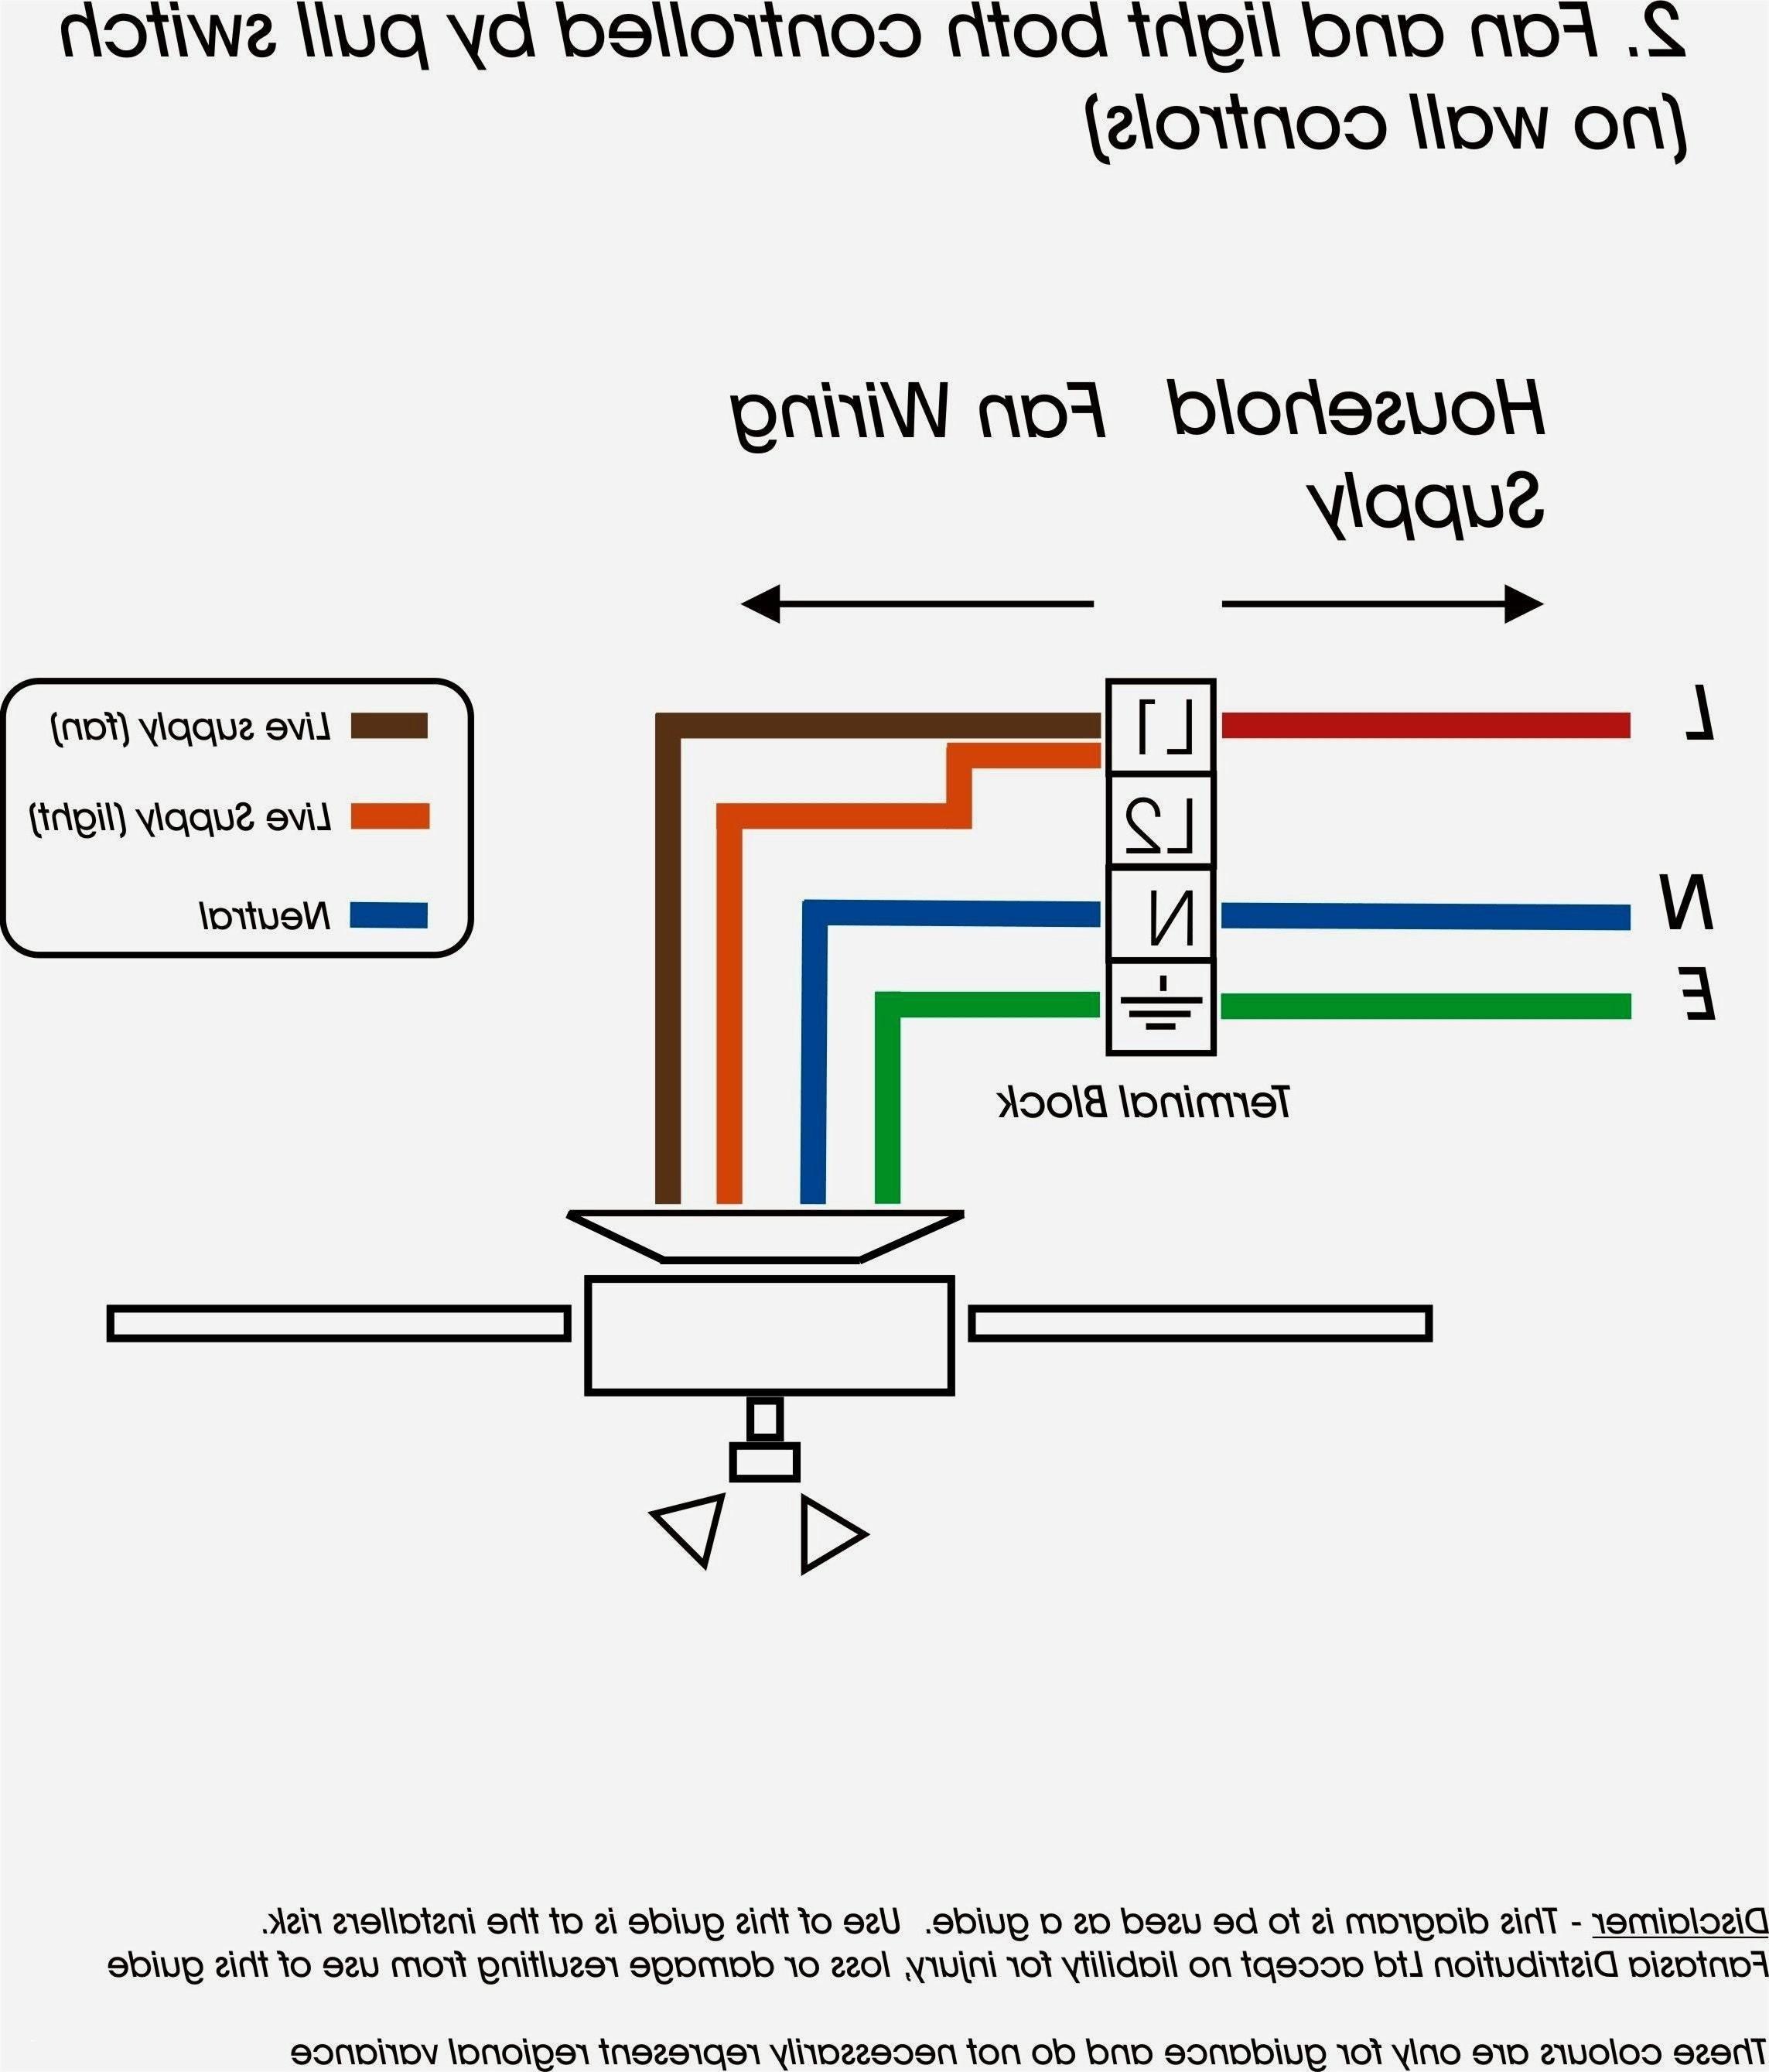 Wiring Diagram For A 7 Round Trailer Plug Fresh Wiring Diagram For 7 Round Trailer New 4 Prong Trailer Wiring